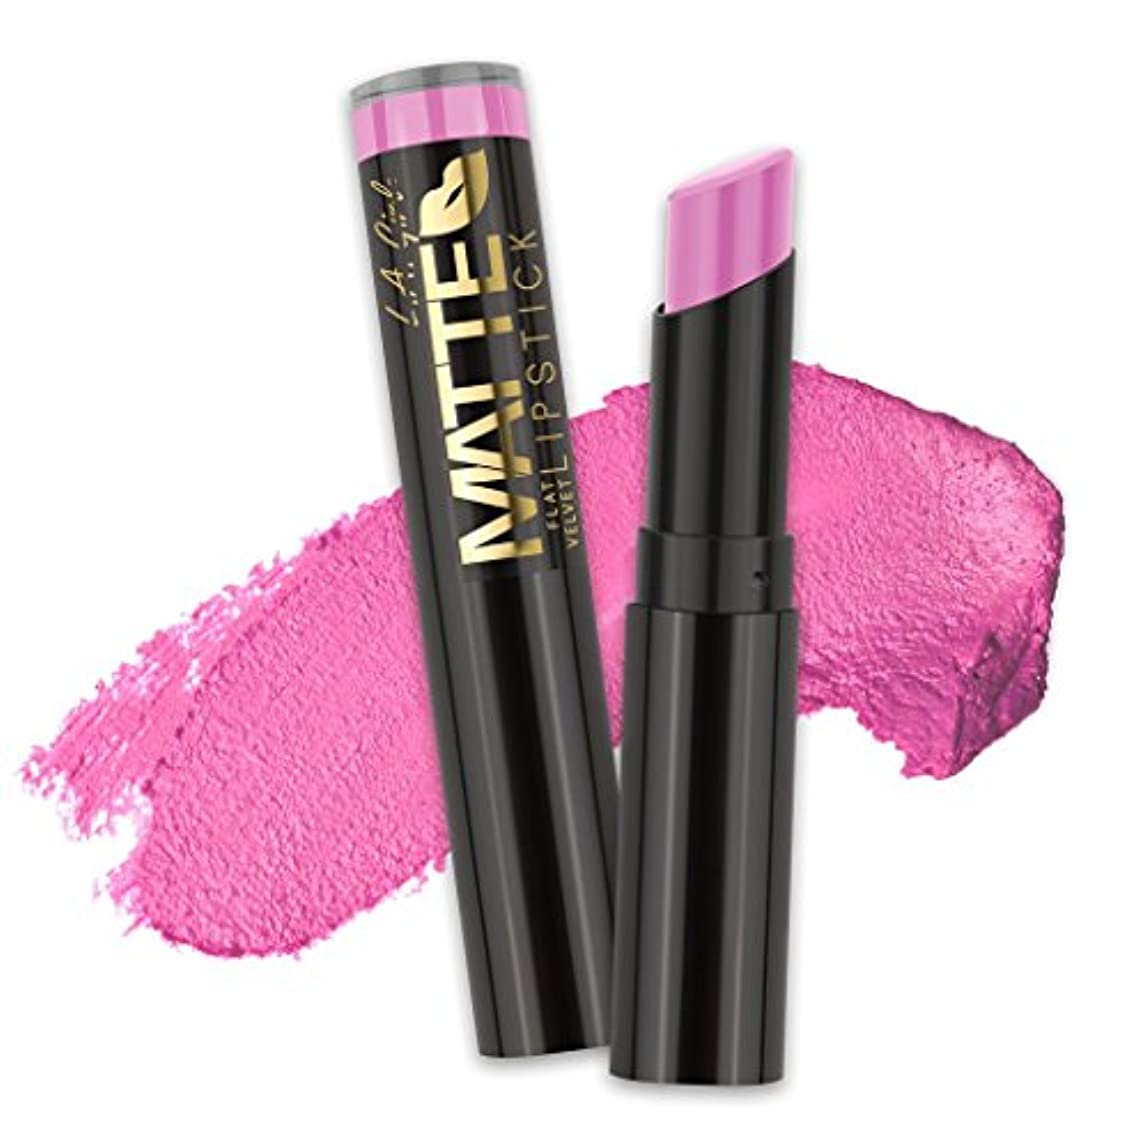 L.A. GIRL Matte Flat Velvet Lipstick Dare to Date (並行輸入品)